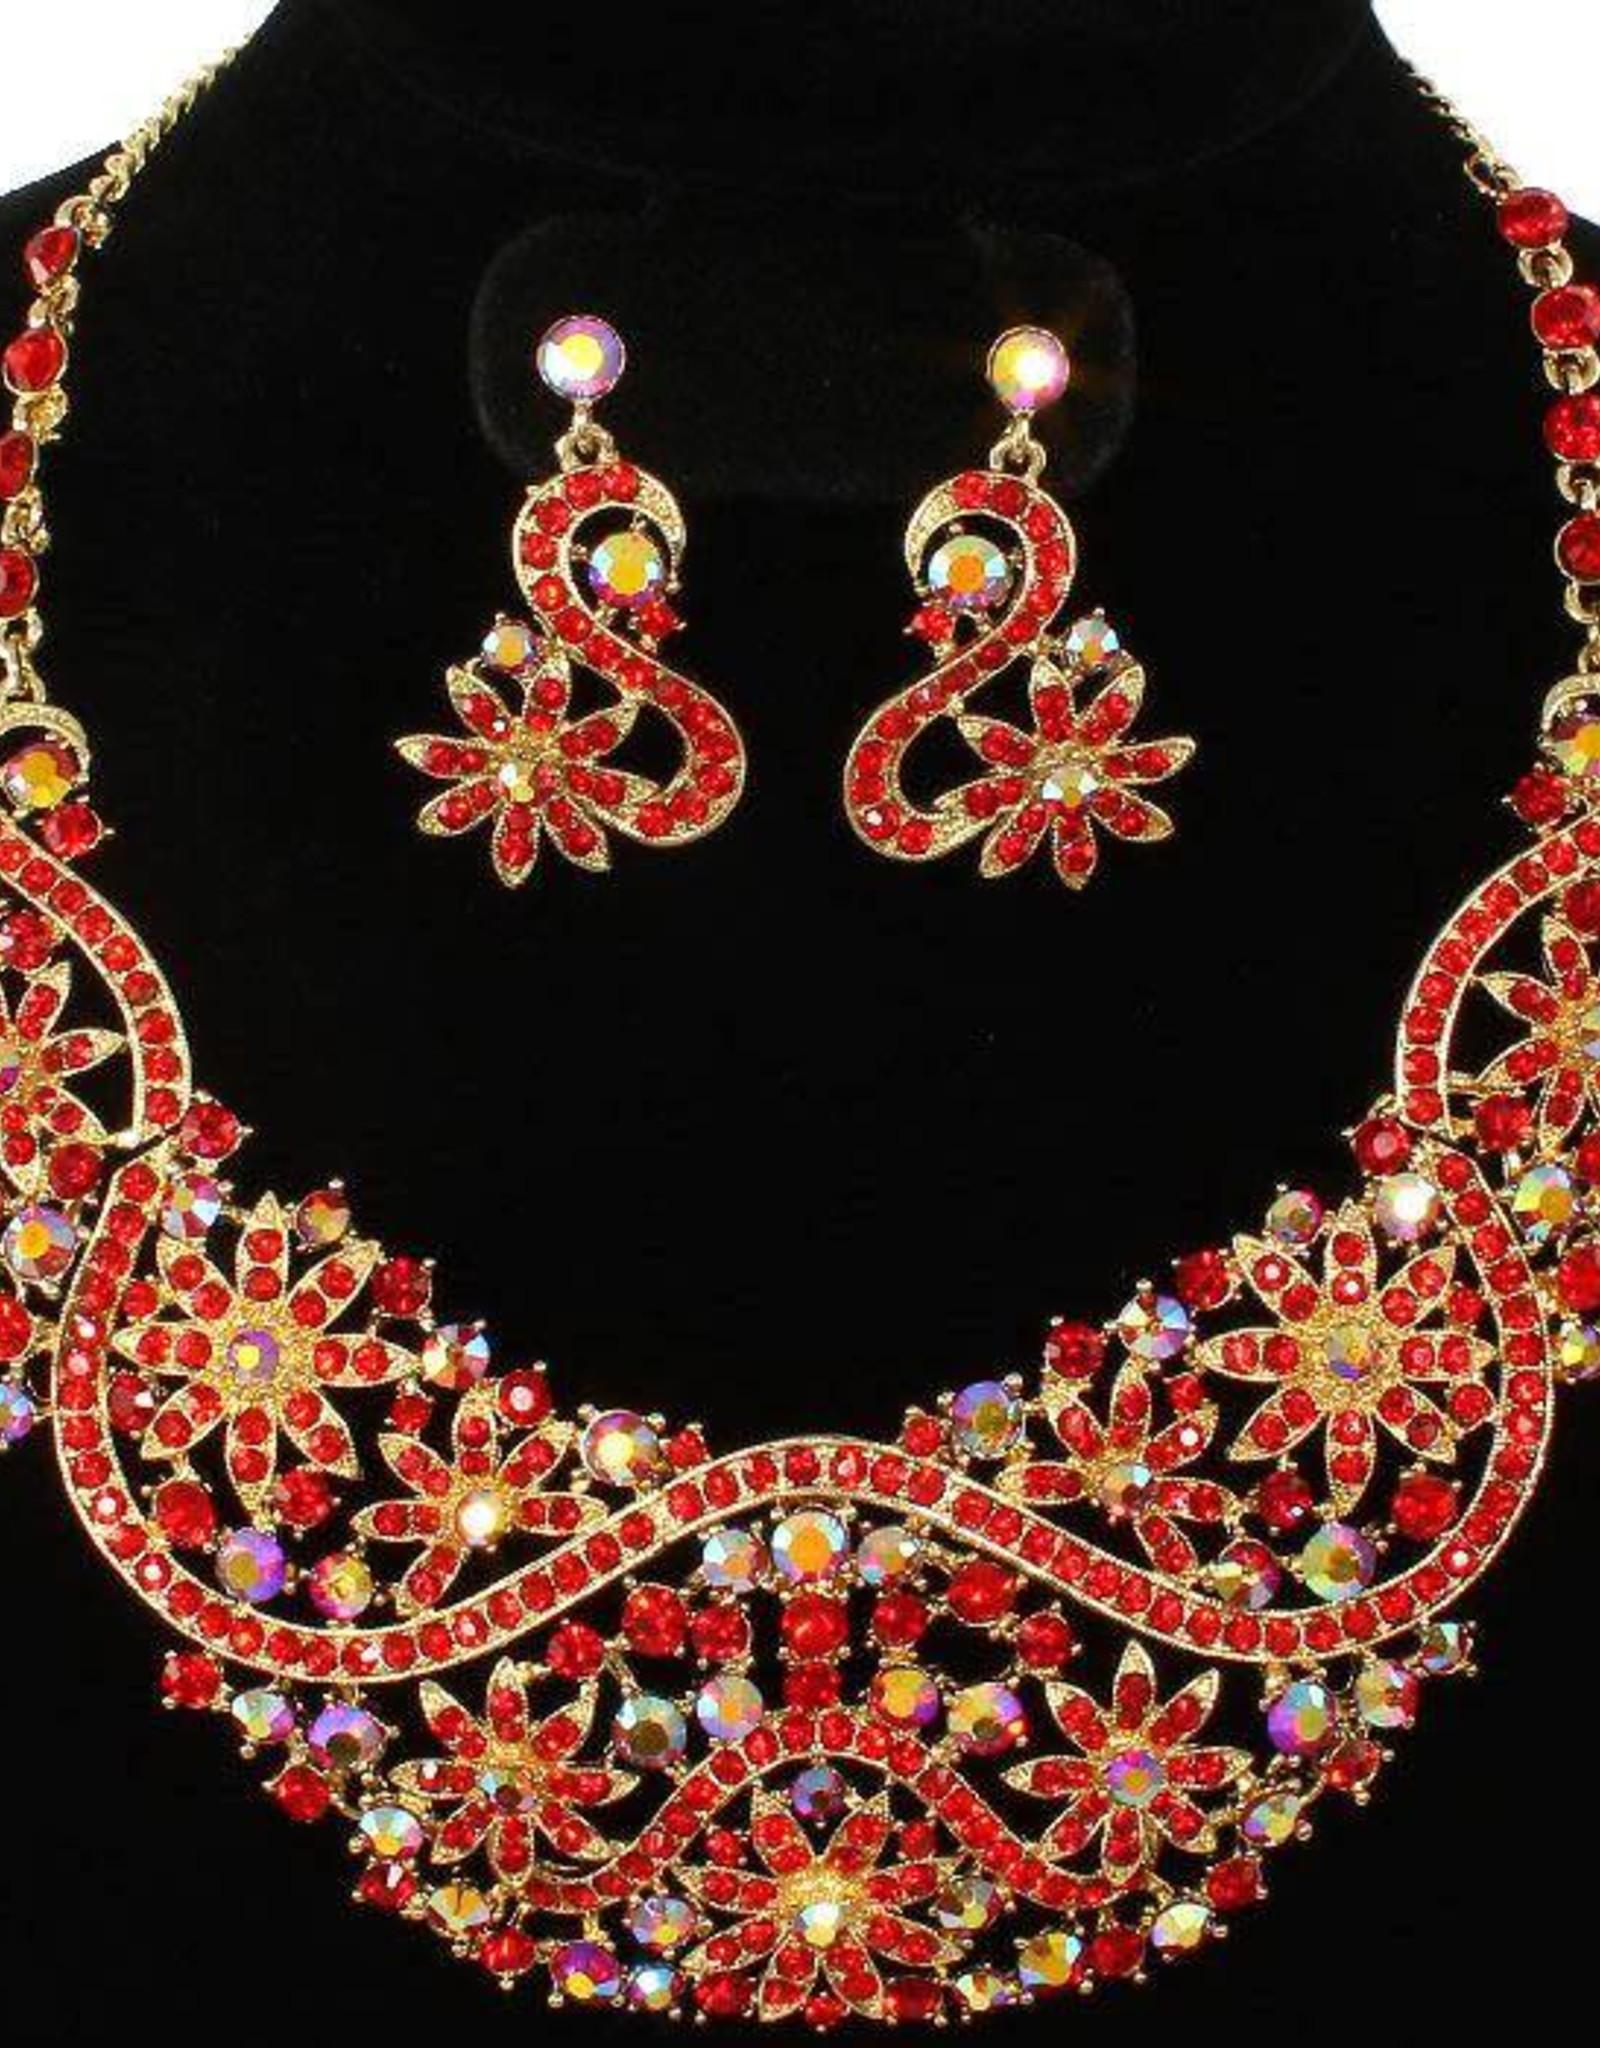 Best Life Yet Necklace Set